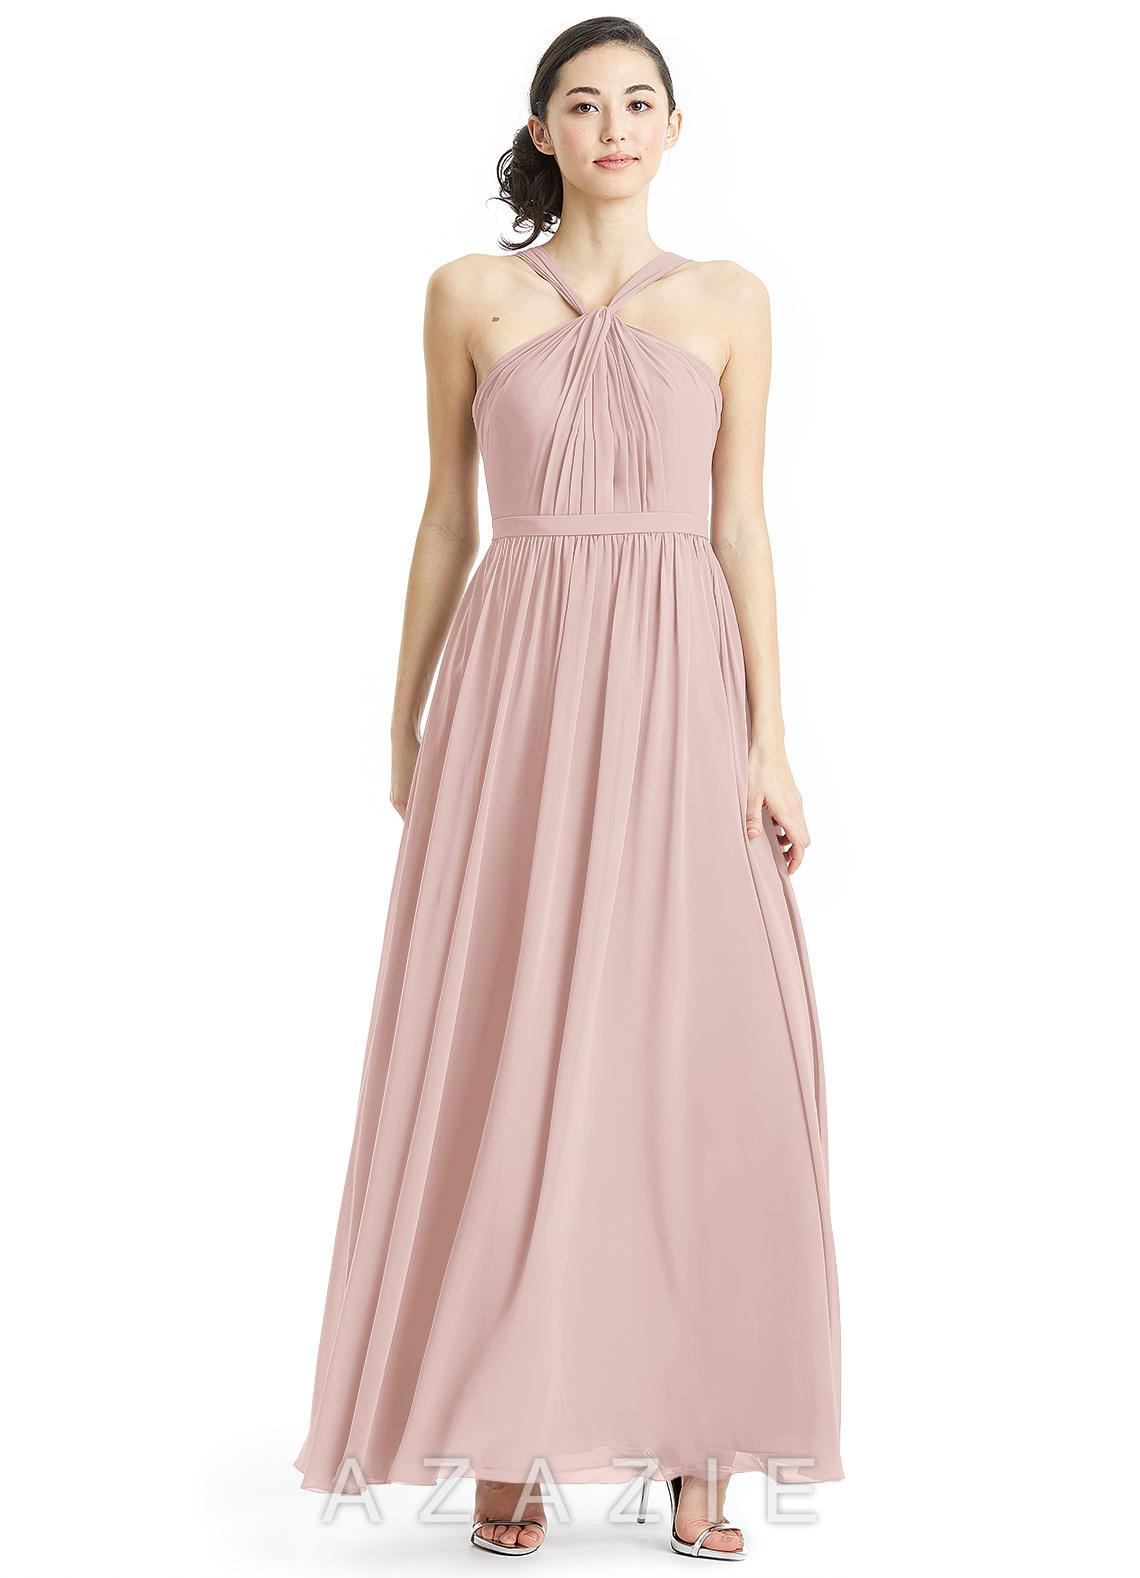 Azazie jacey bridesmaid dress azazie color dusty rose ombrellifo Gallery